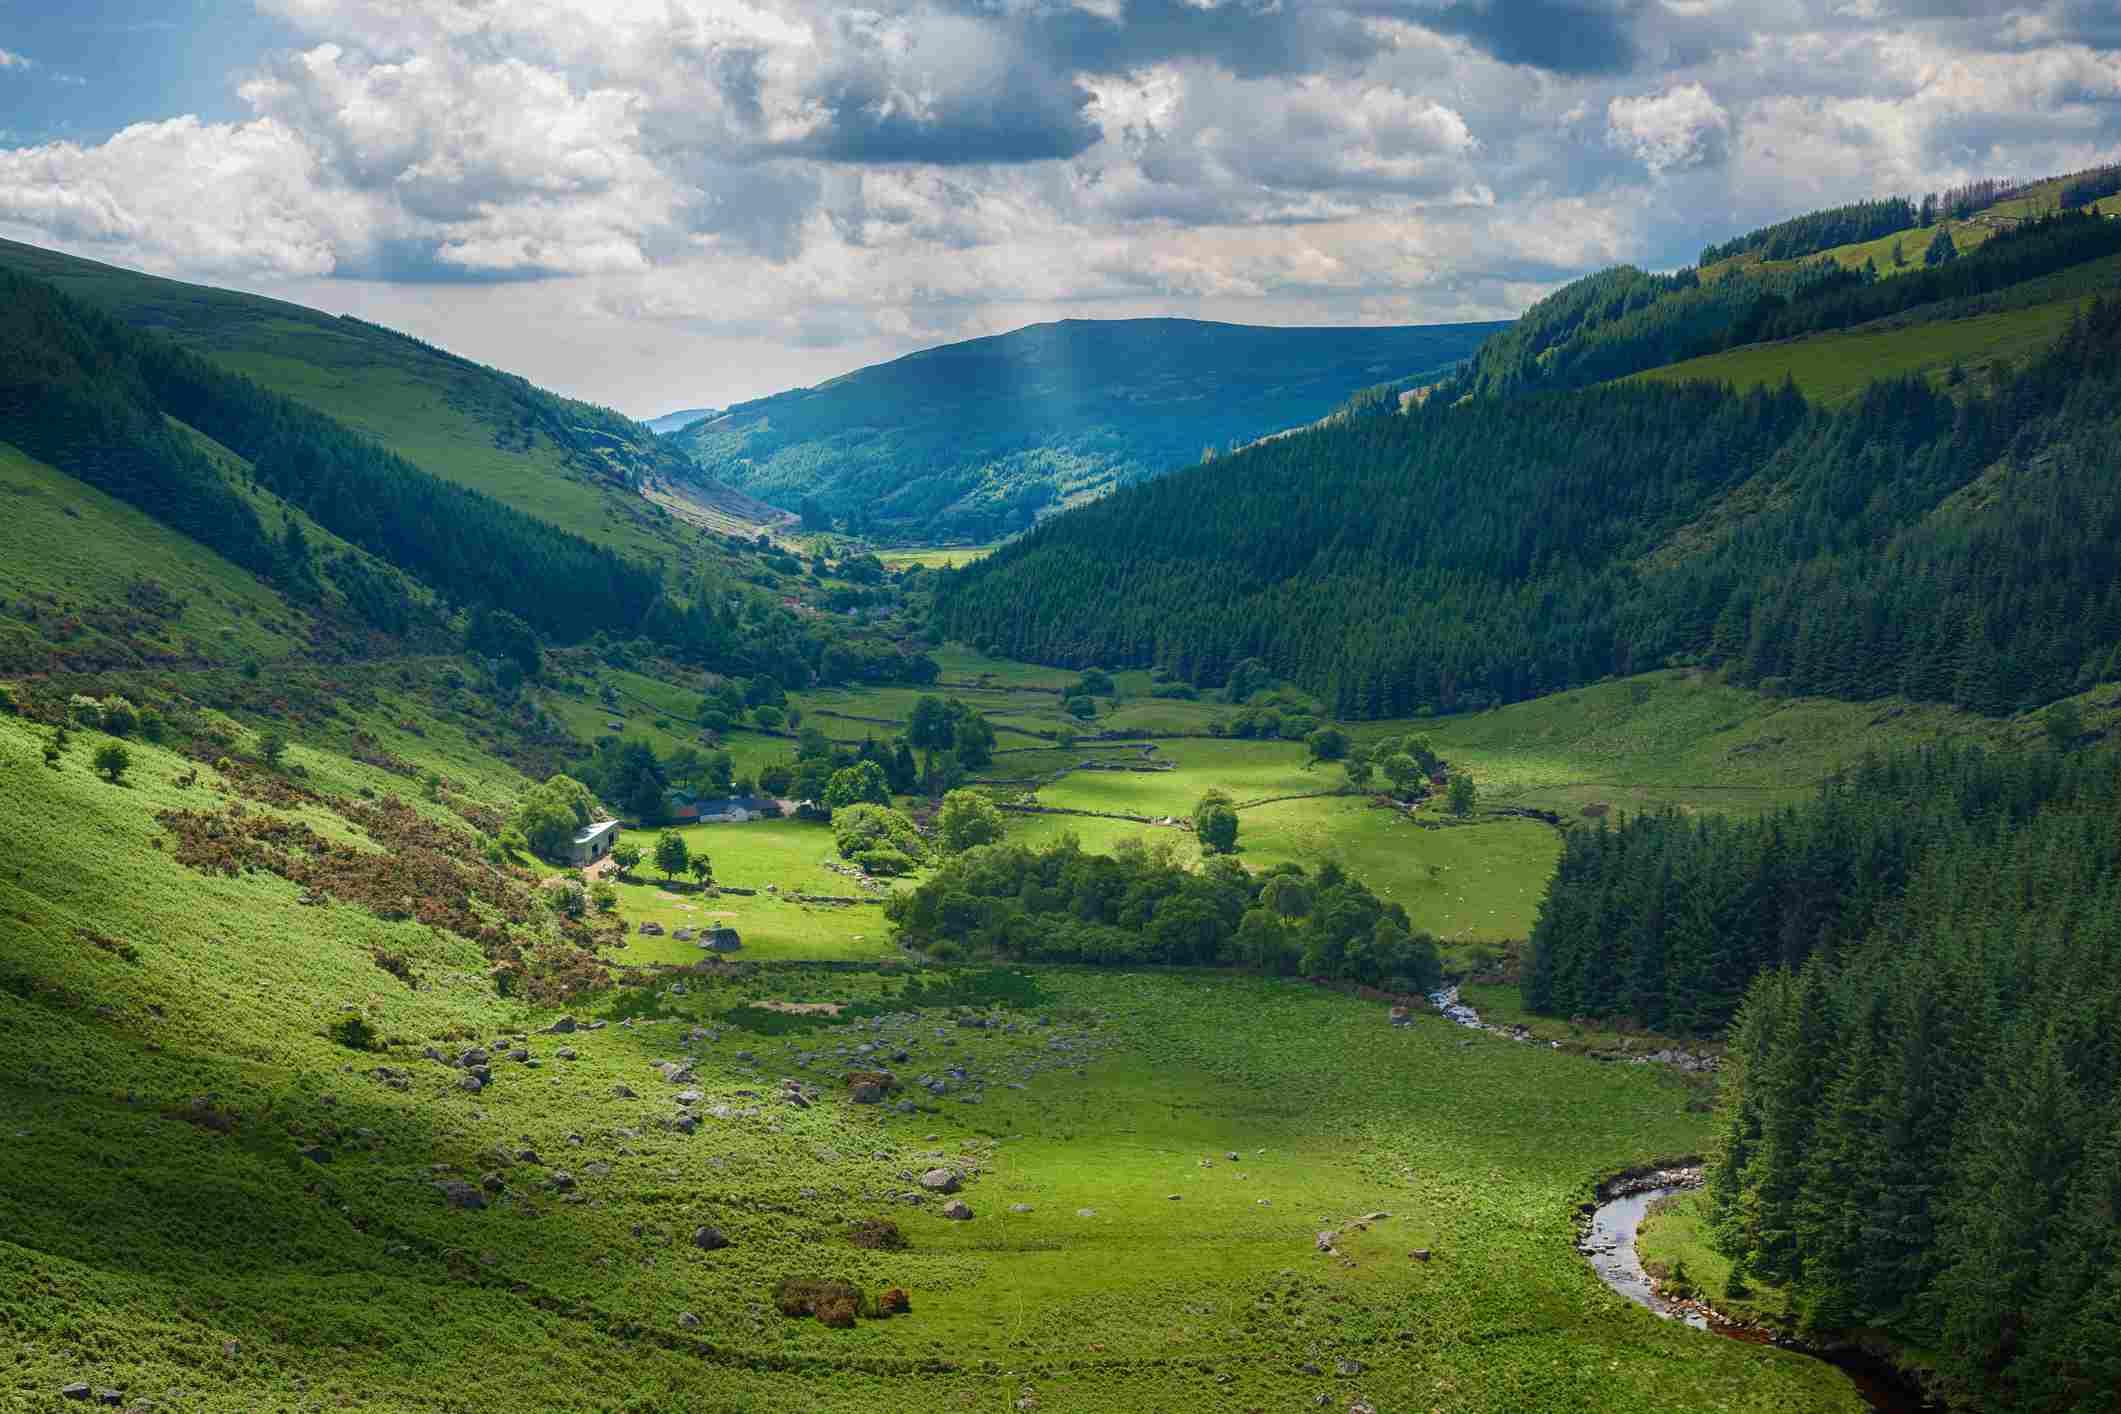 Glenmacknass valley in County Wicklow, Ireland